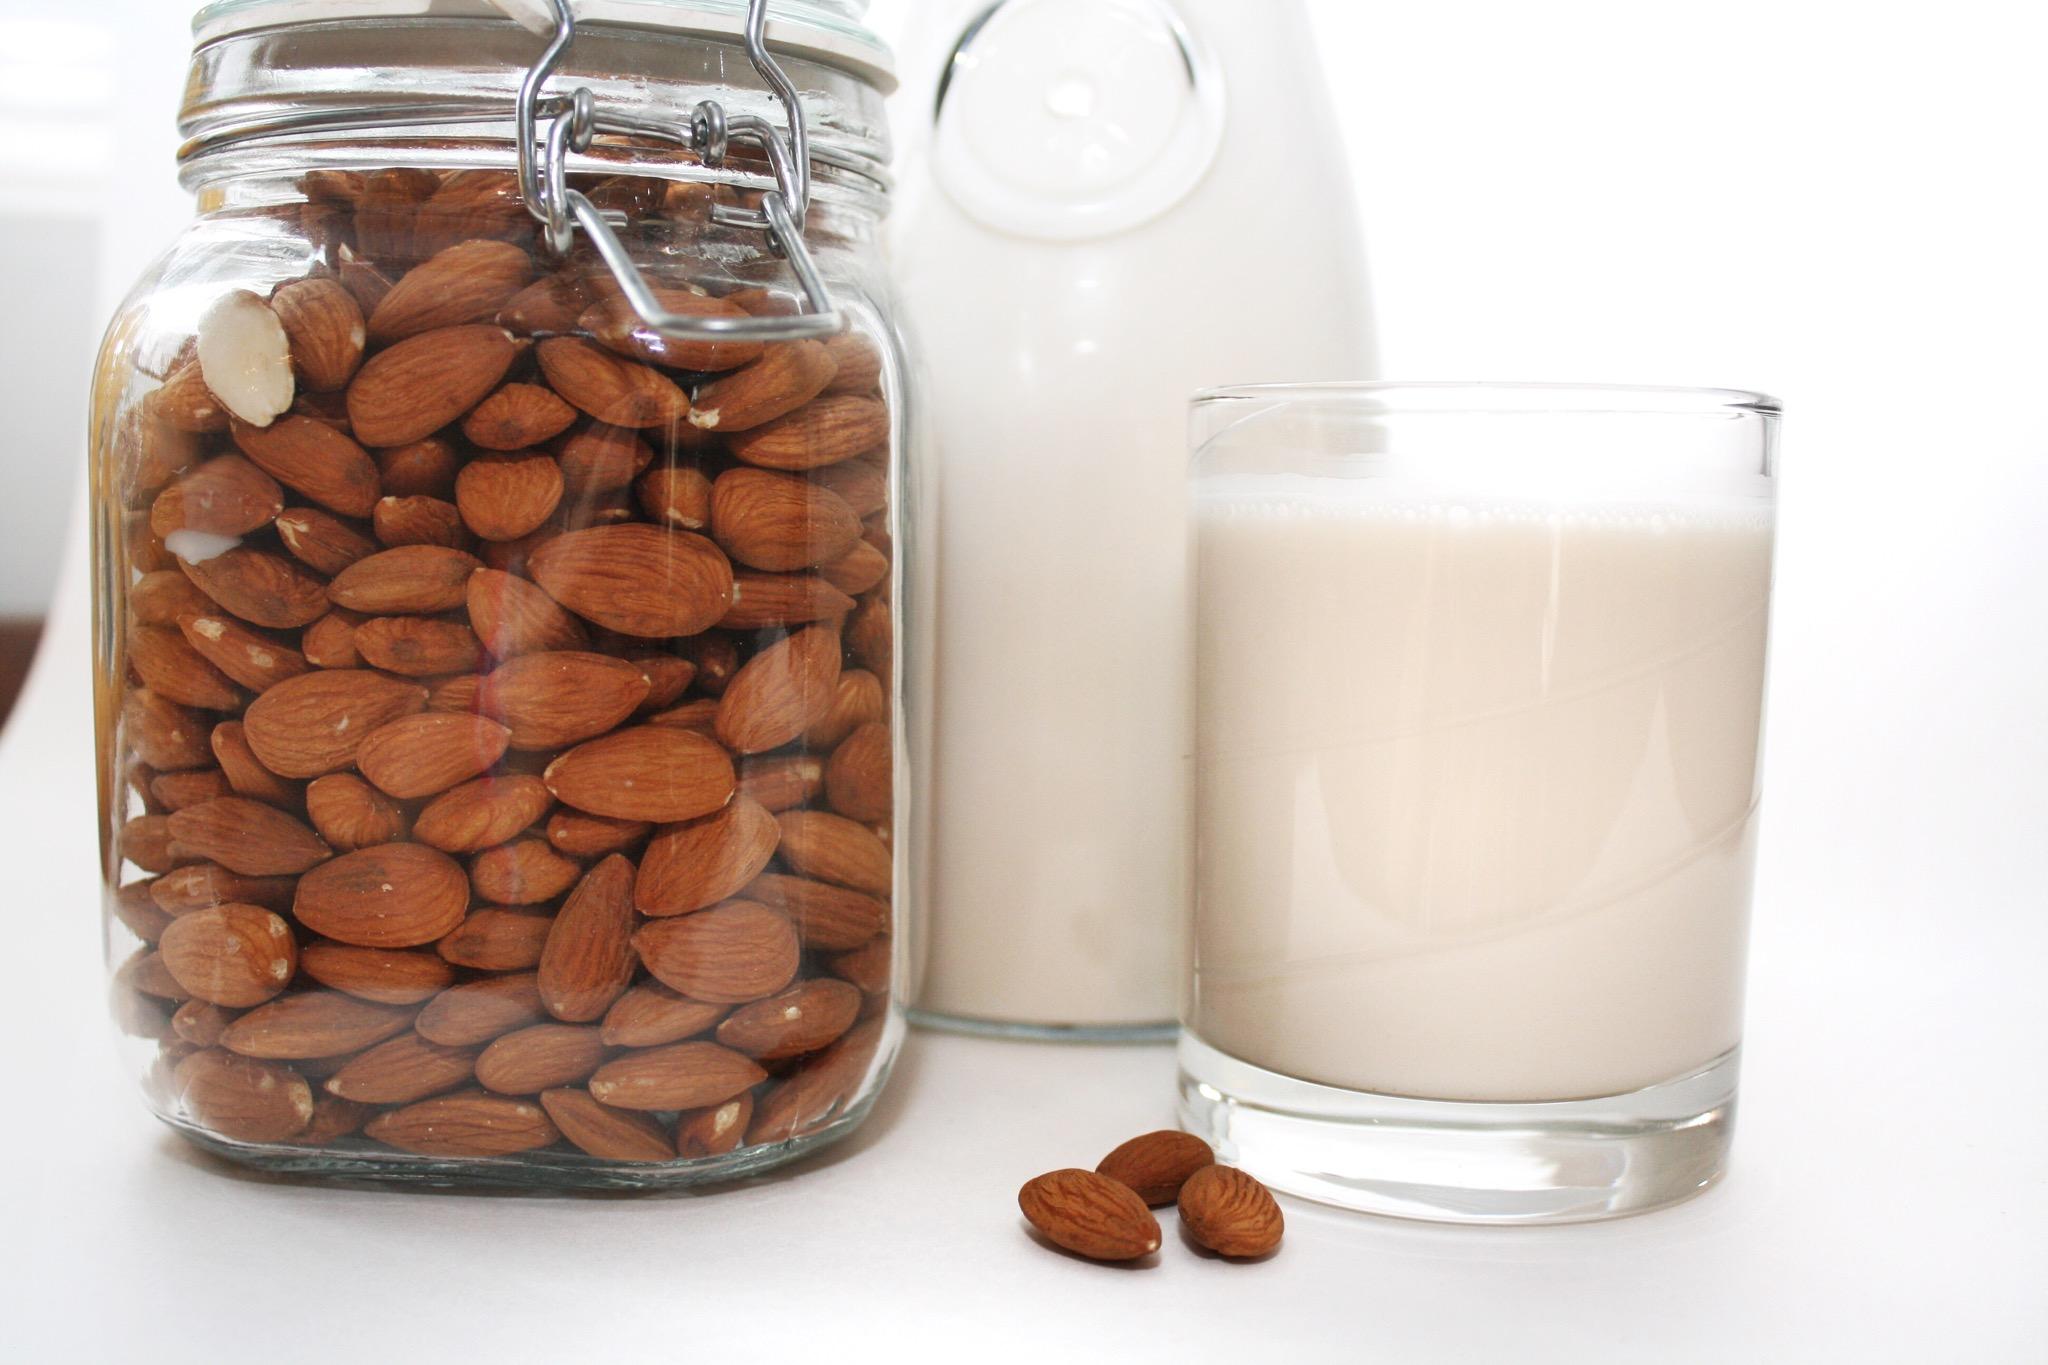 Image result for jar of almonds